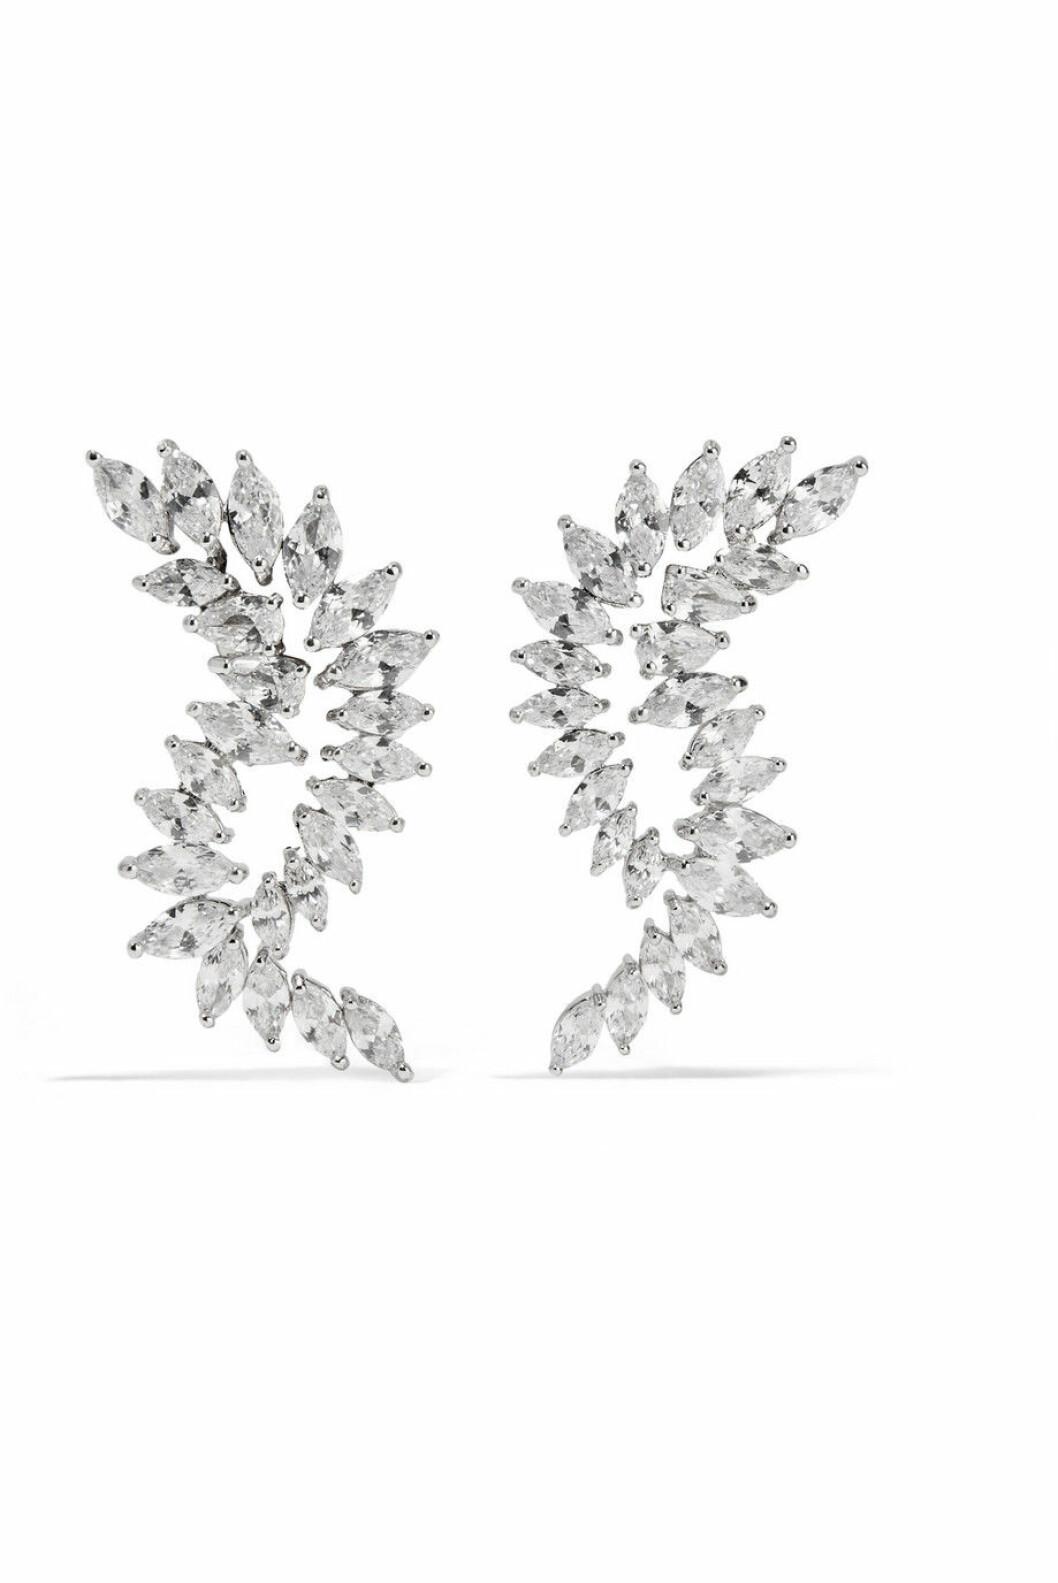 <strong>Øredobber fra Kenneth Jay Lane |885,-| https:</strong>//www.net-a-porter.com/no/en/product/1064594/kenneth_jay_lane/rhodium-plated-cubic-zirconia-earrings